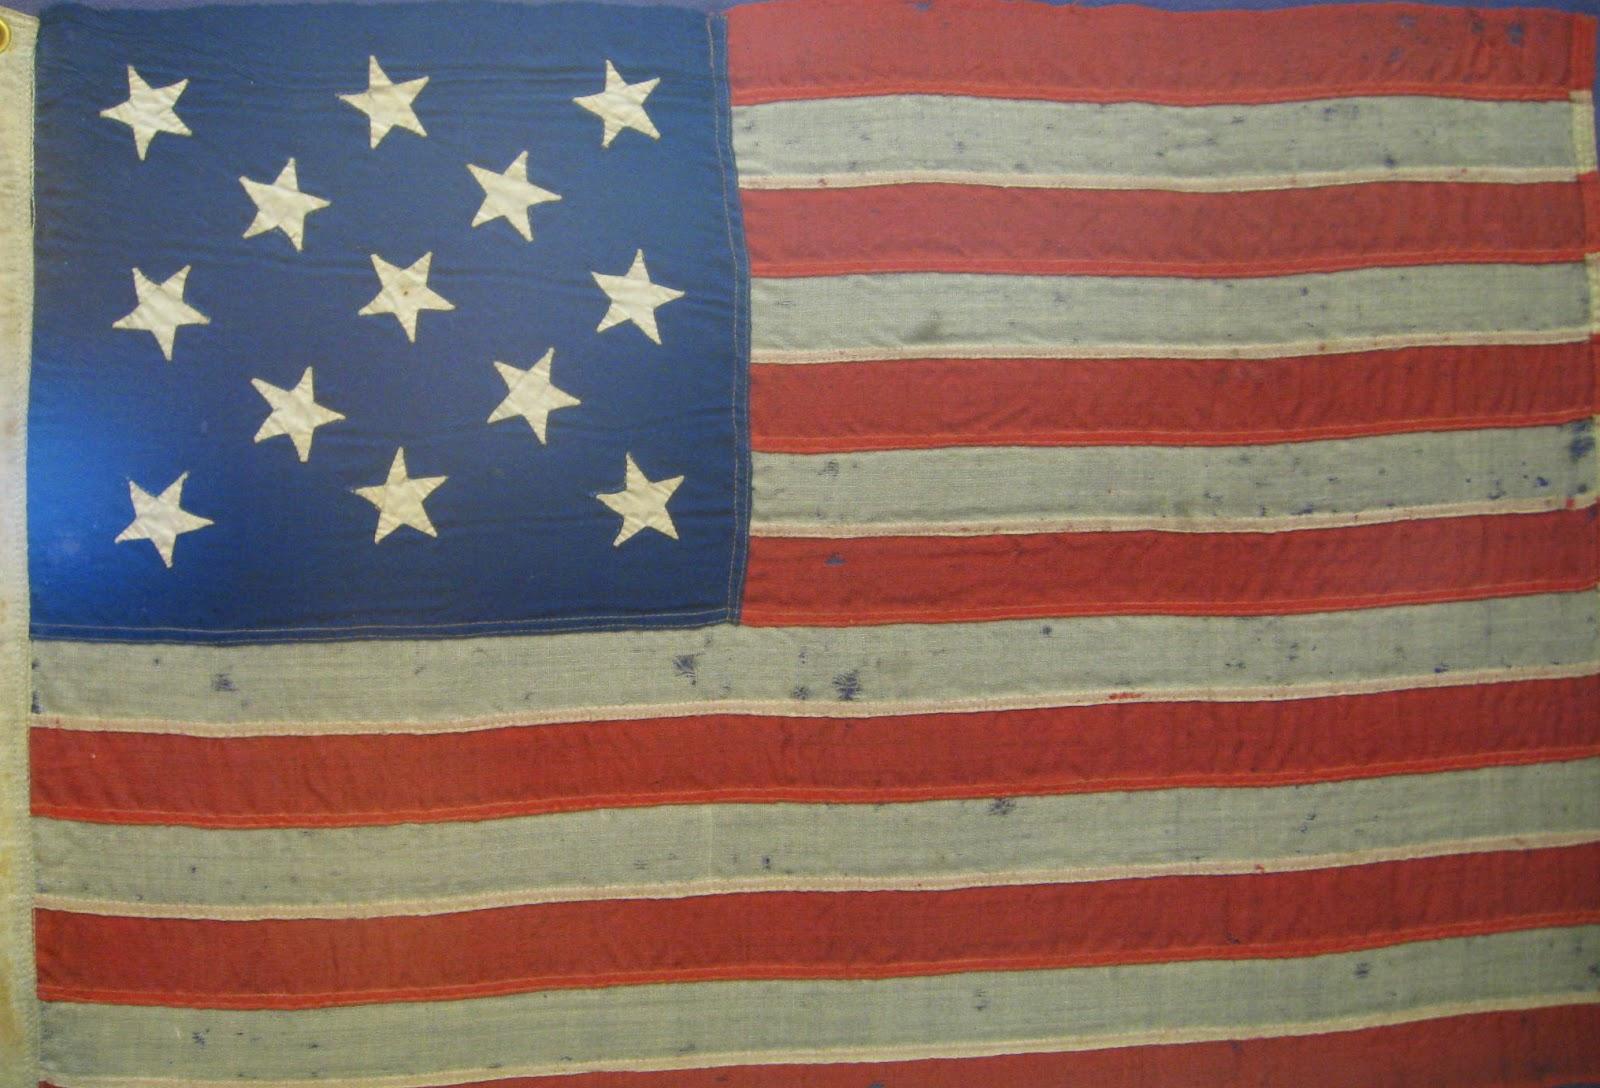 hampton roads naval museum a thirteen star flag from the civil war